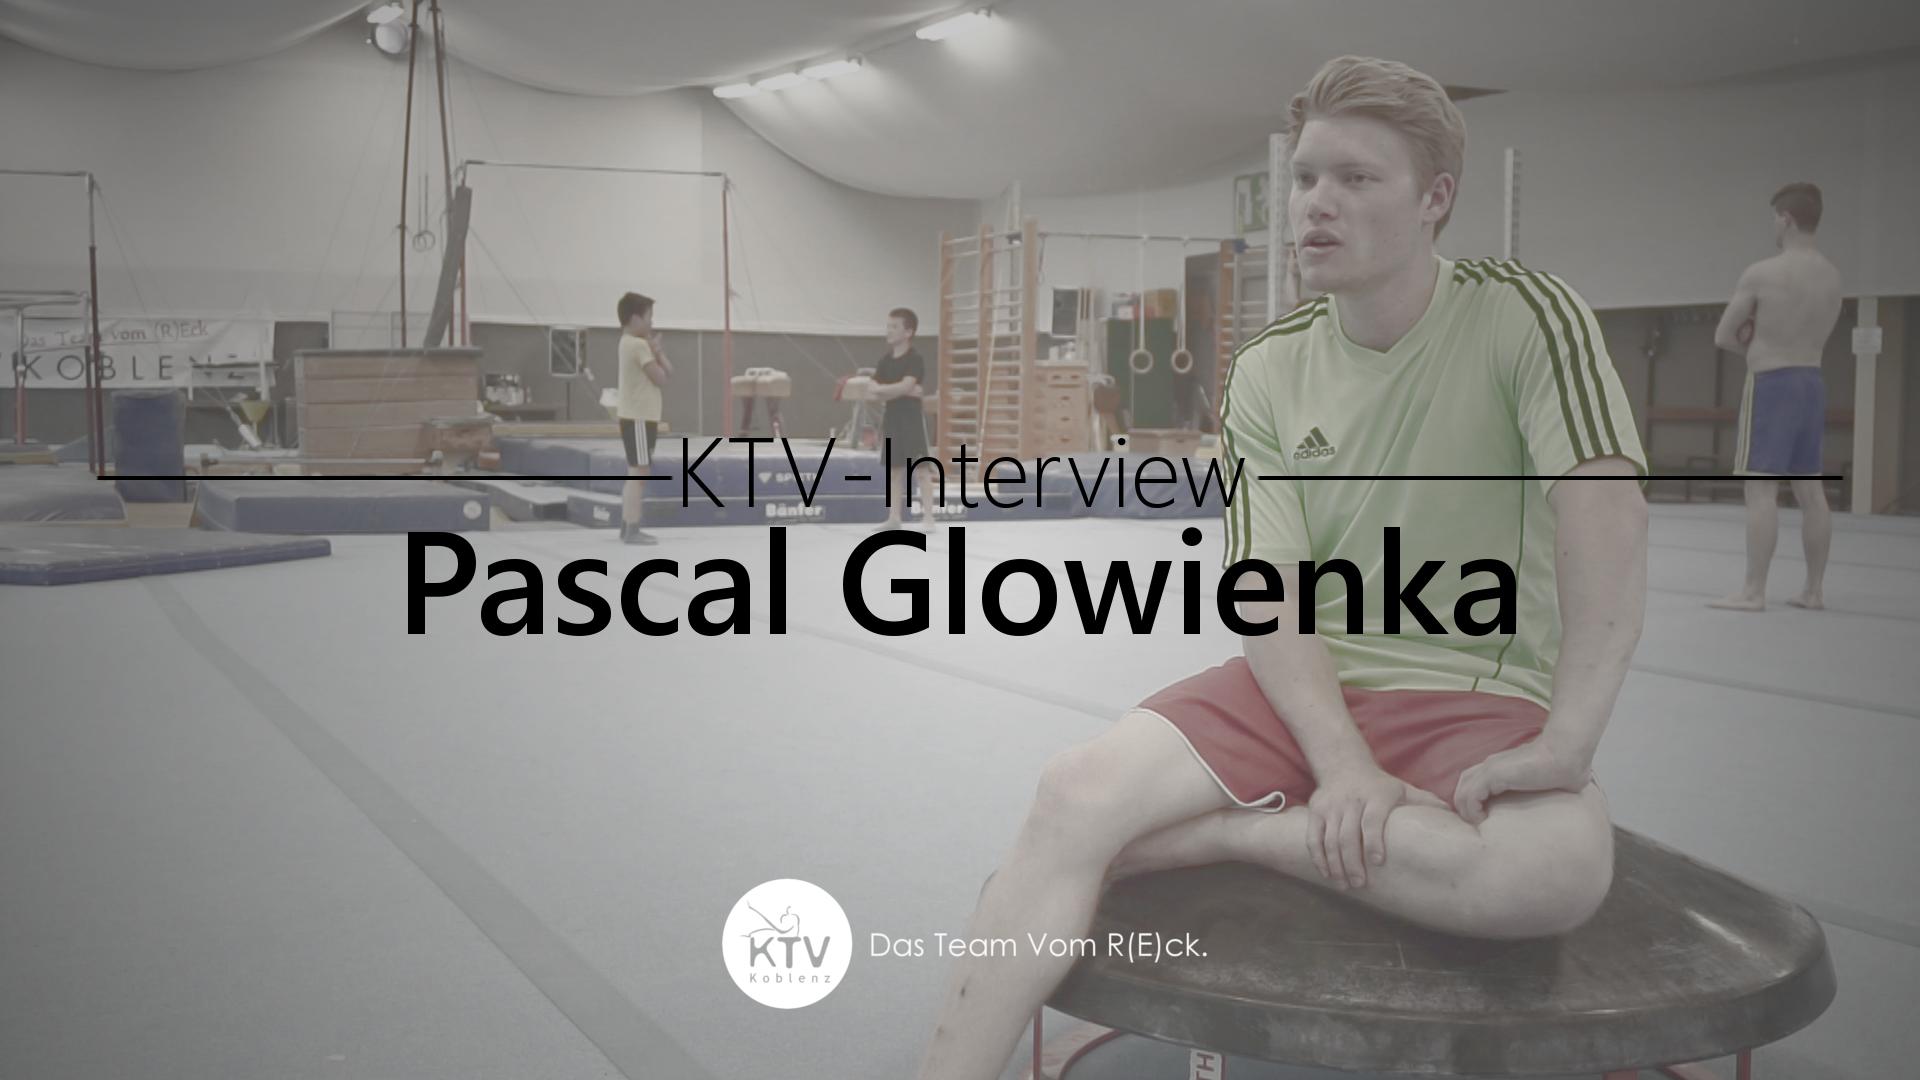 KTV-Interview   Pascal Glowienka